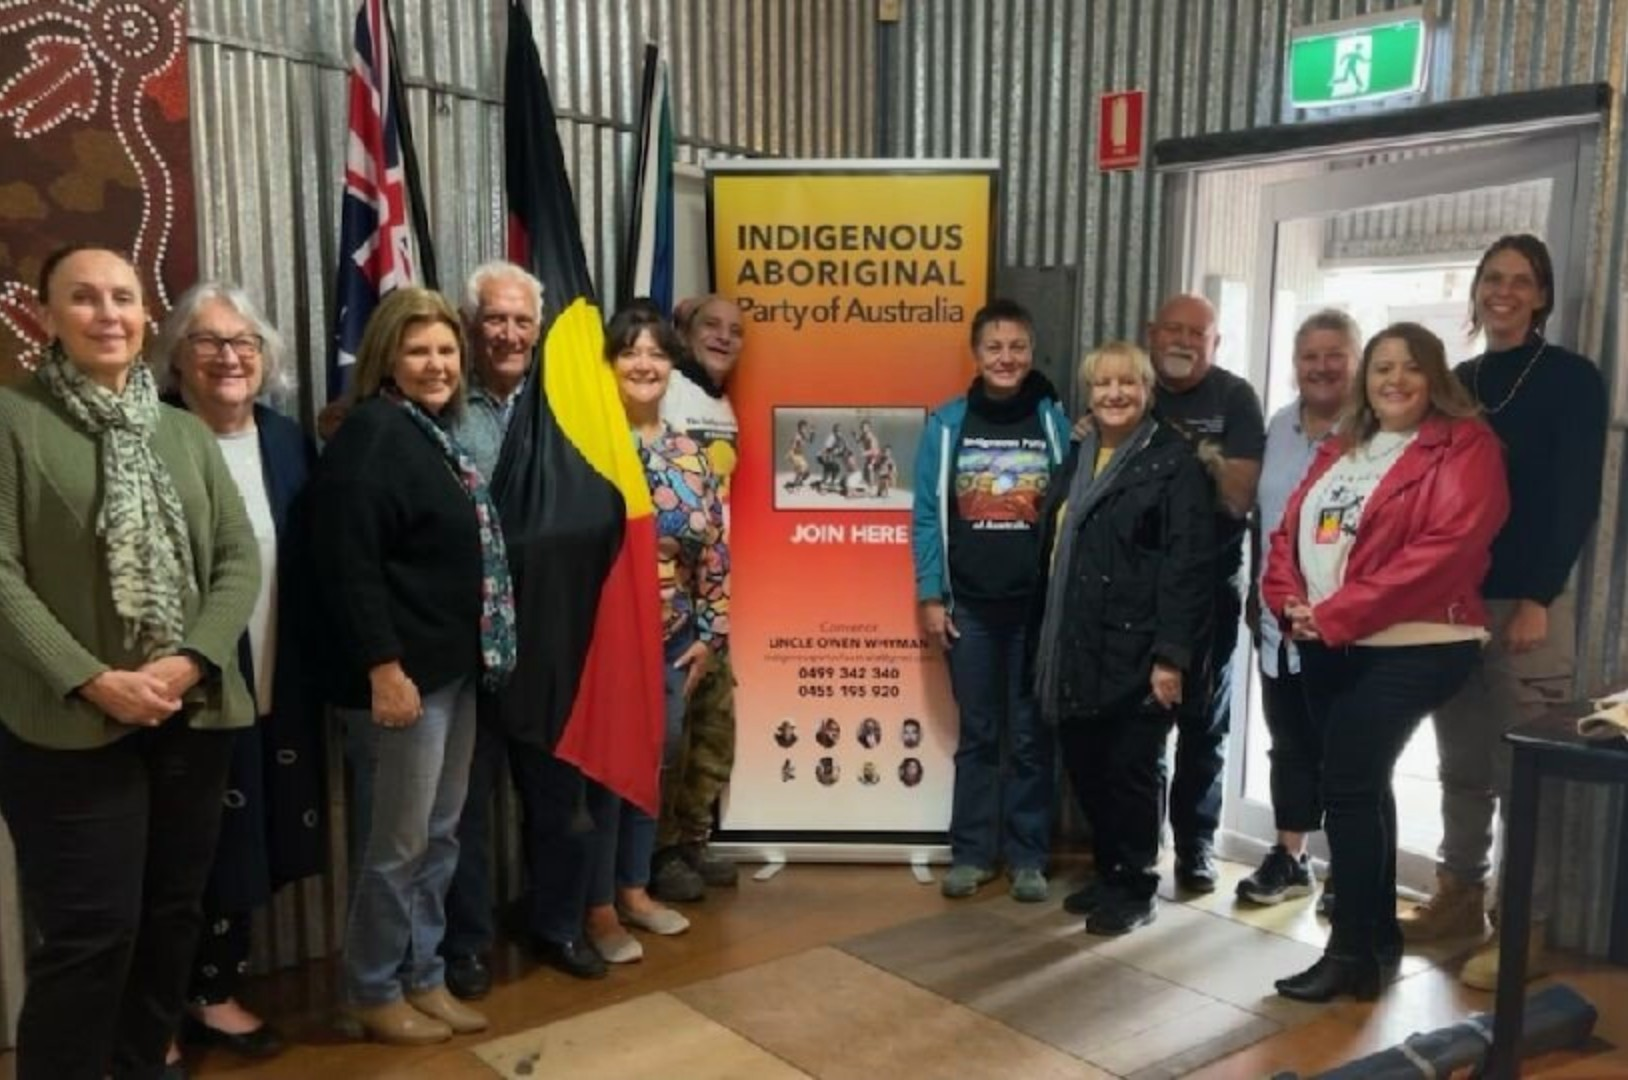 Indigenous political party facing registration hurdles